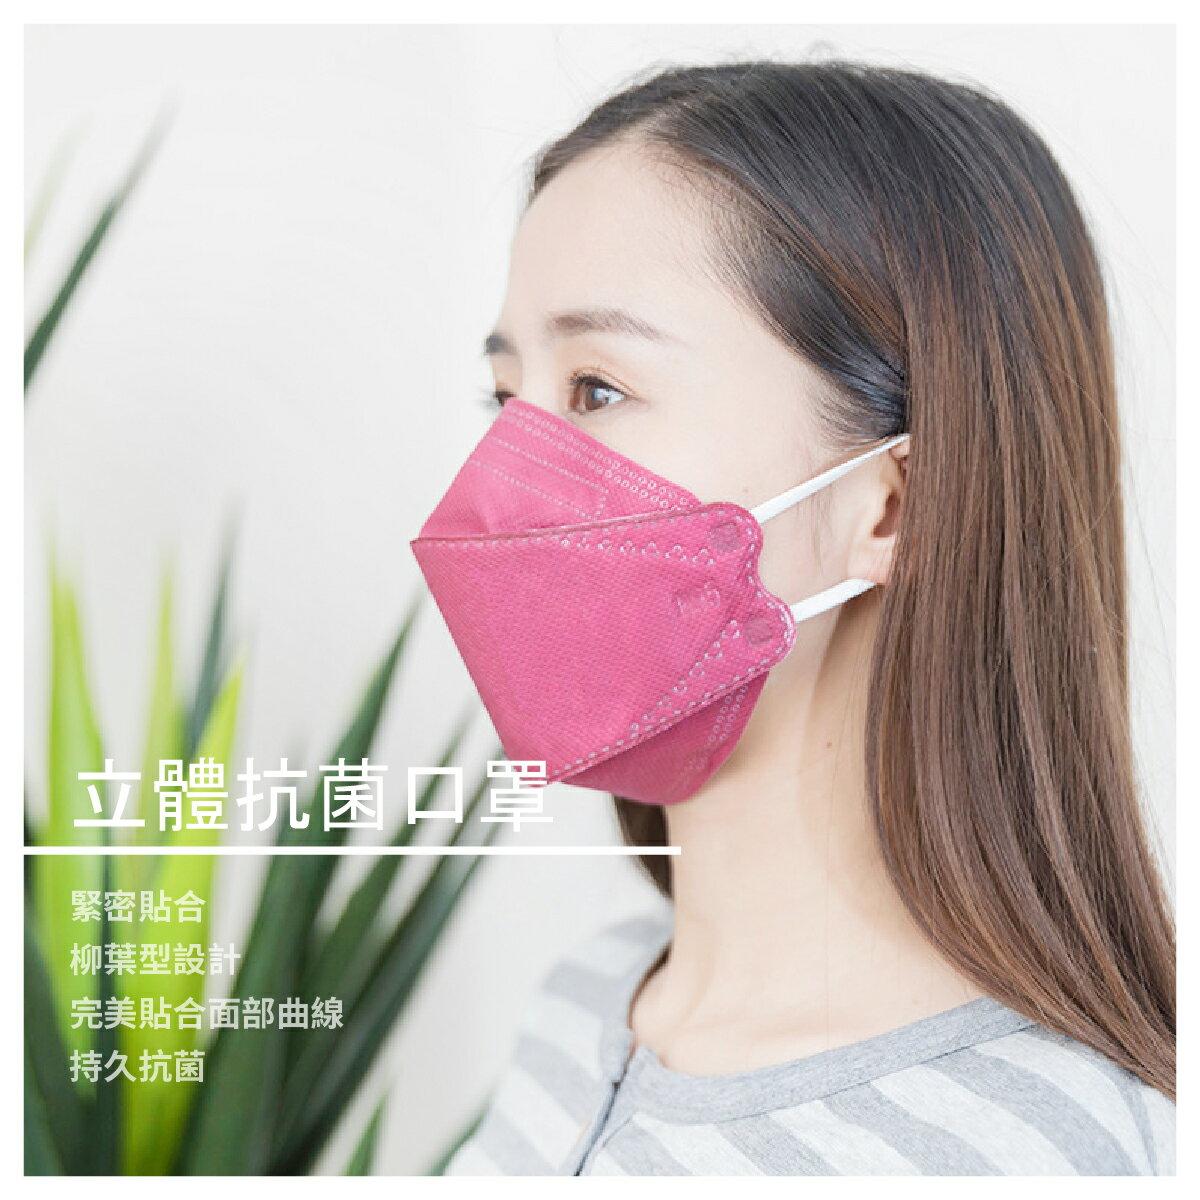 【Oxygen 奧世潔】金護盾 長效雙週拋立體抗菌口罩 2入/包 年節超超超優惠~